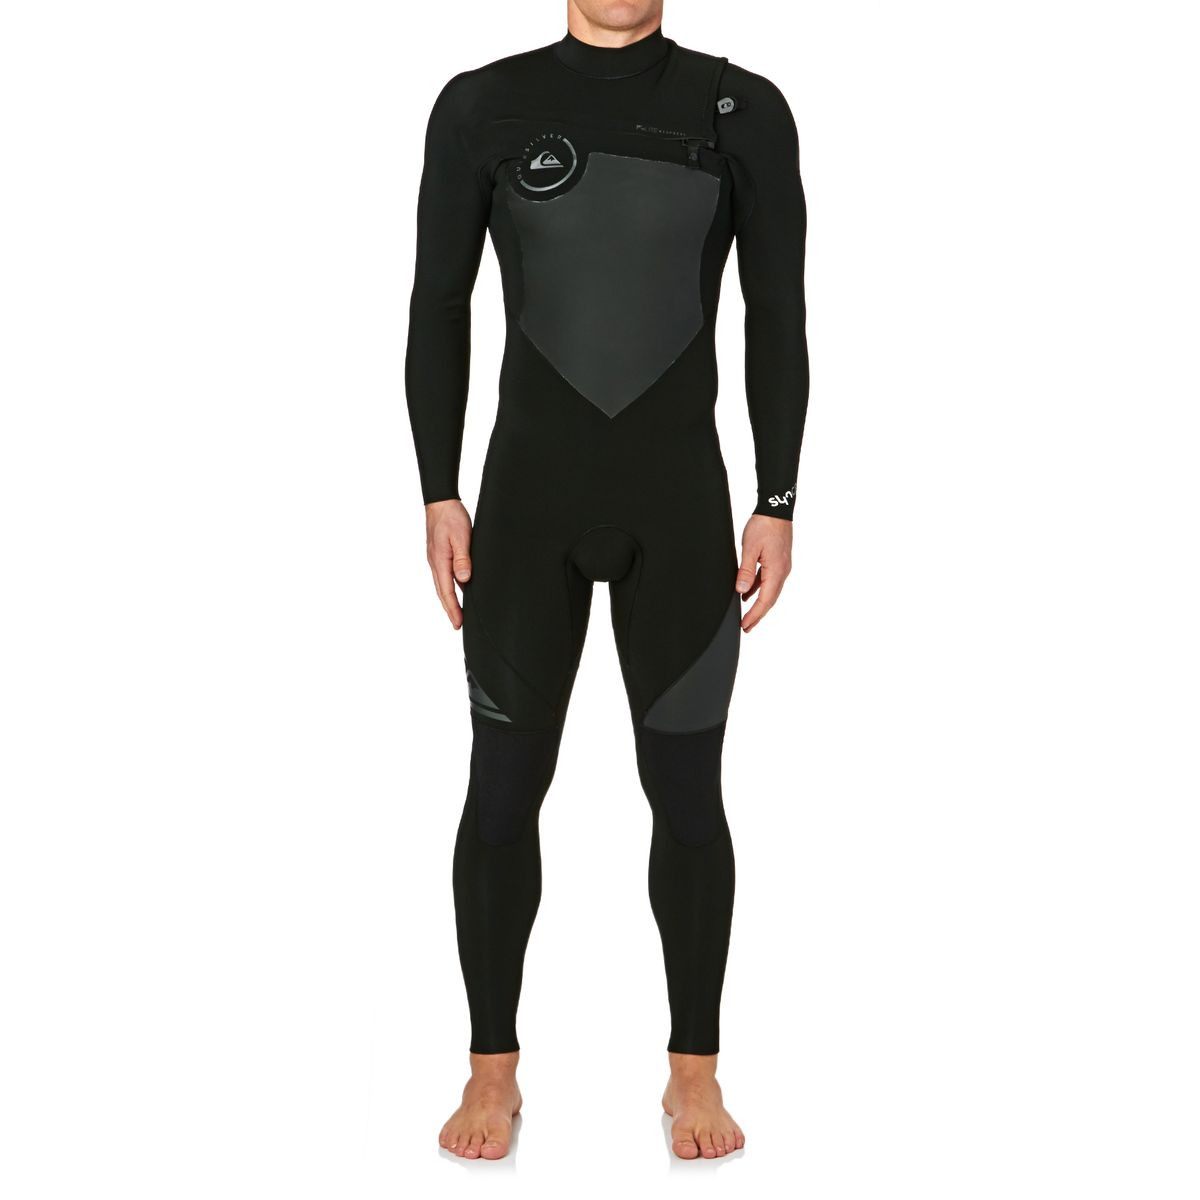 Quiksilver Syncro 3/2mm 2017 Chest Zip Wetsuit - Black